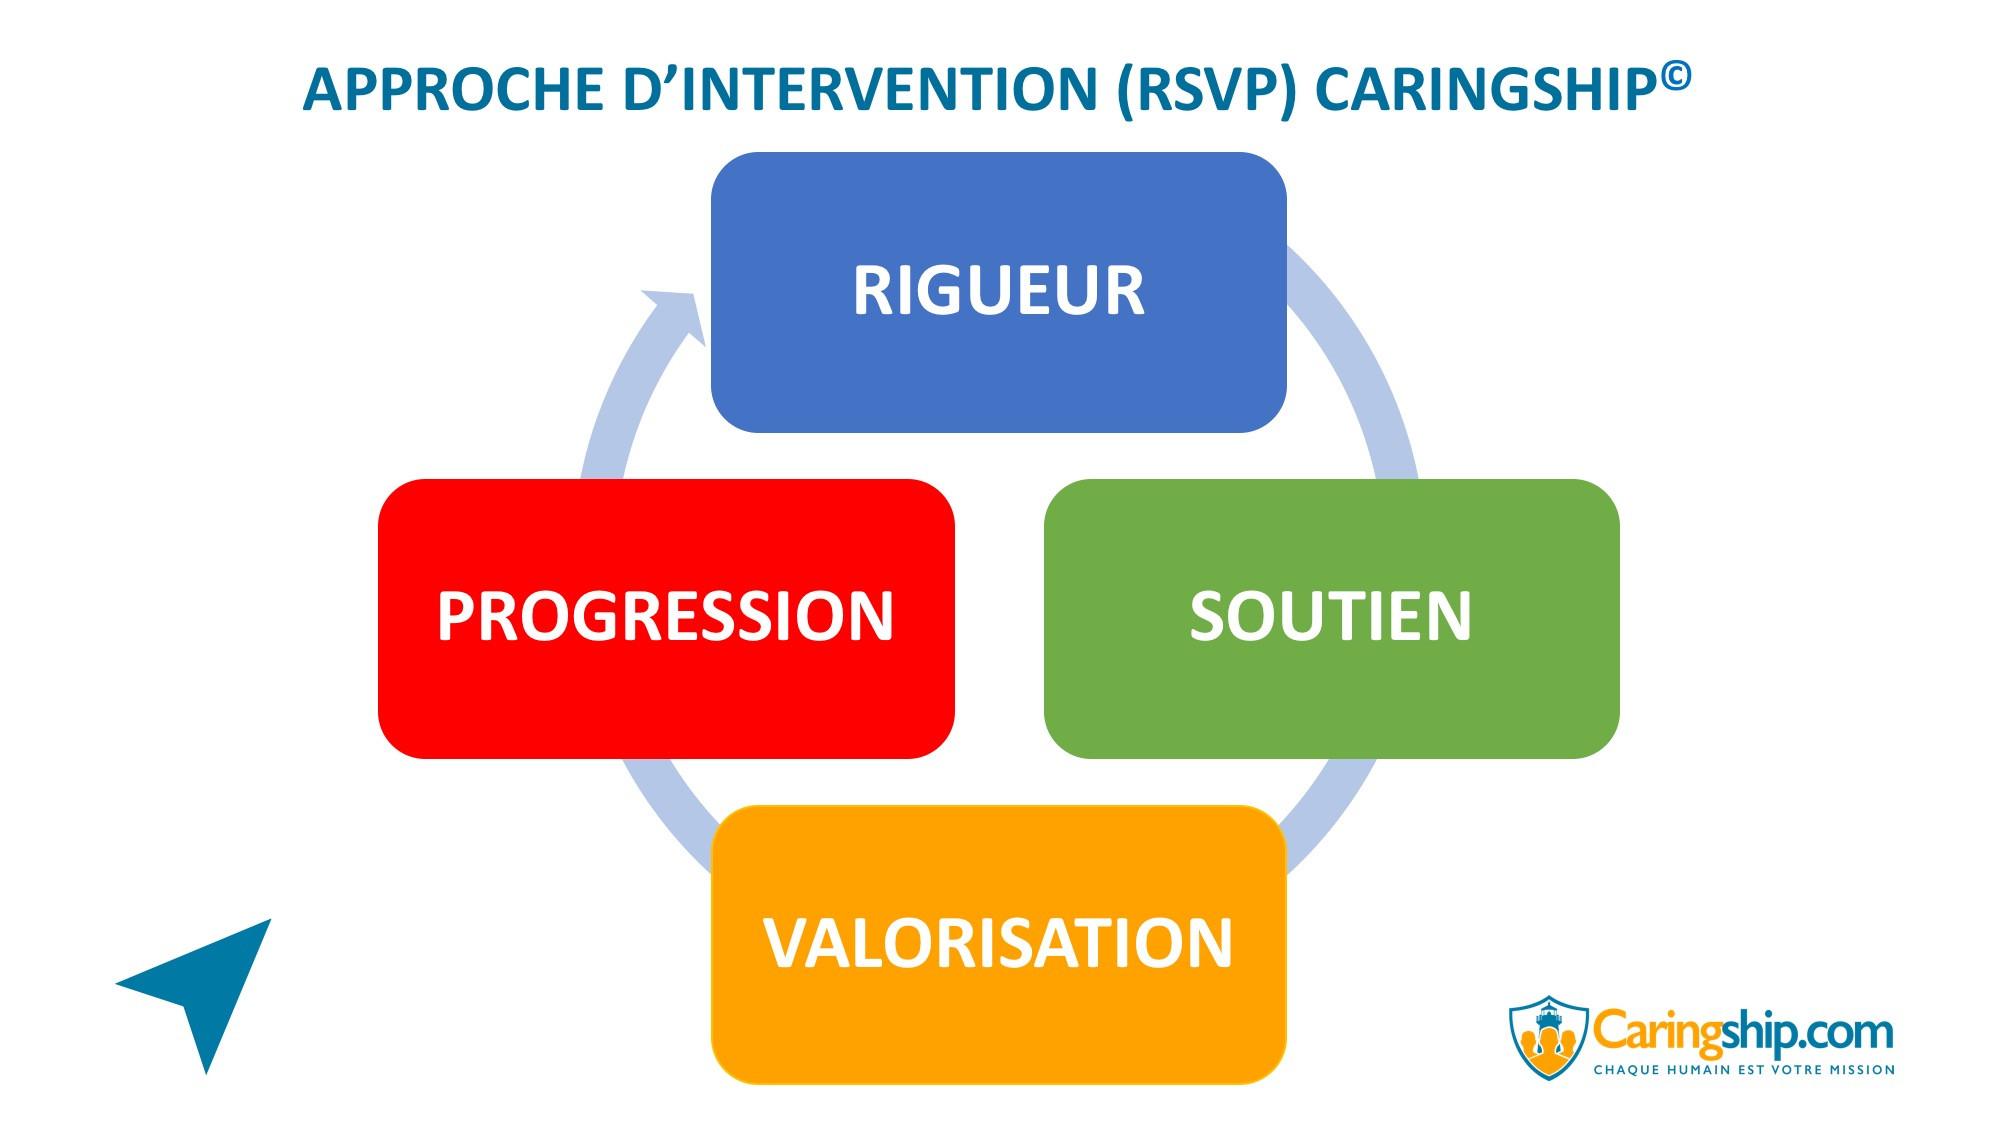 Approche d'intervention (RSVP)